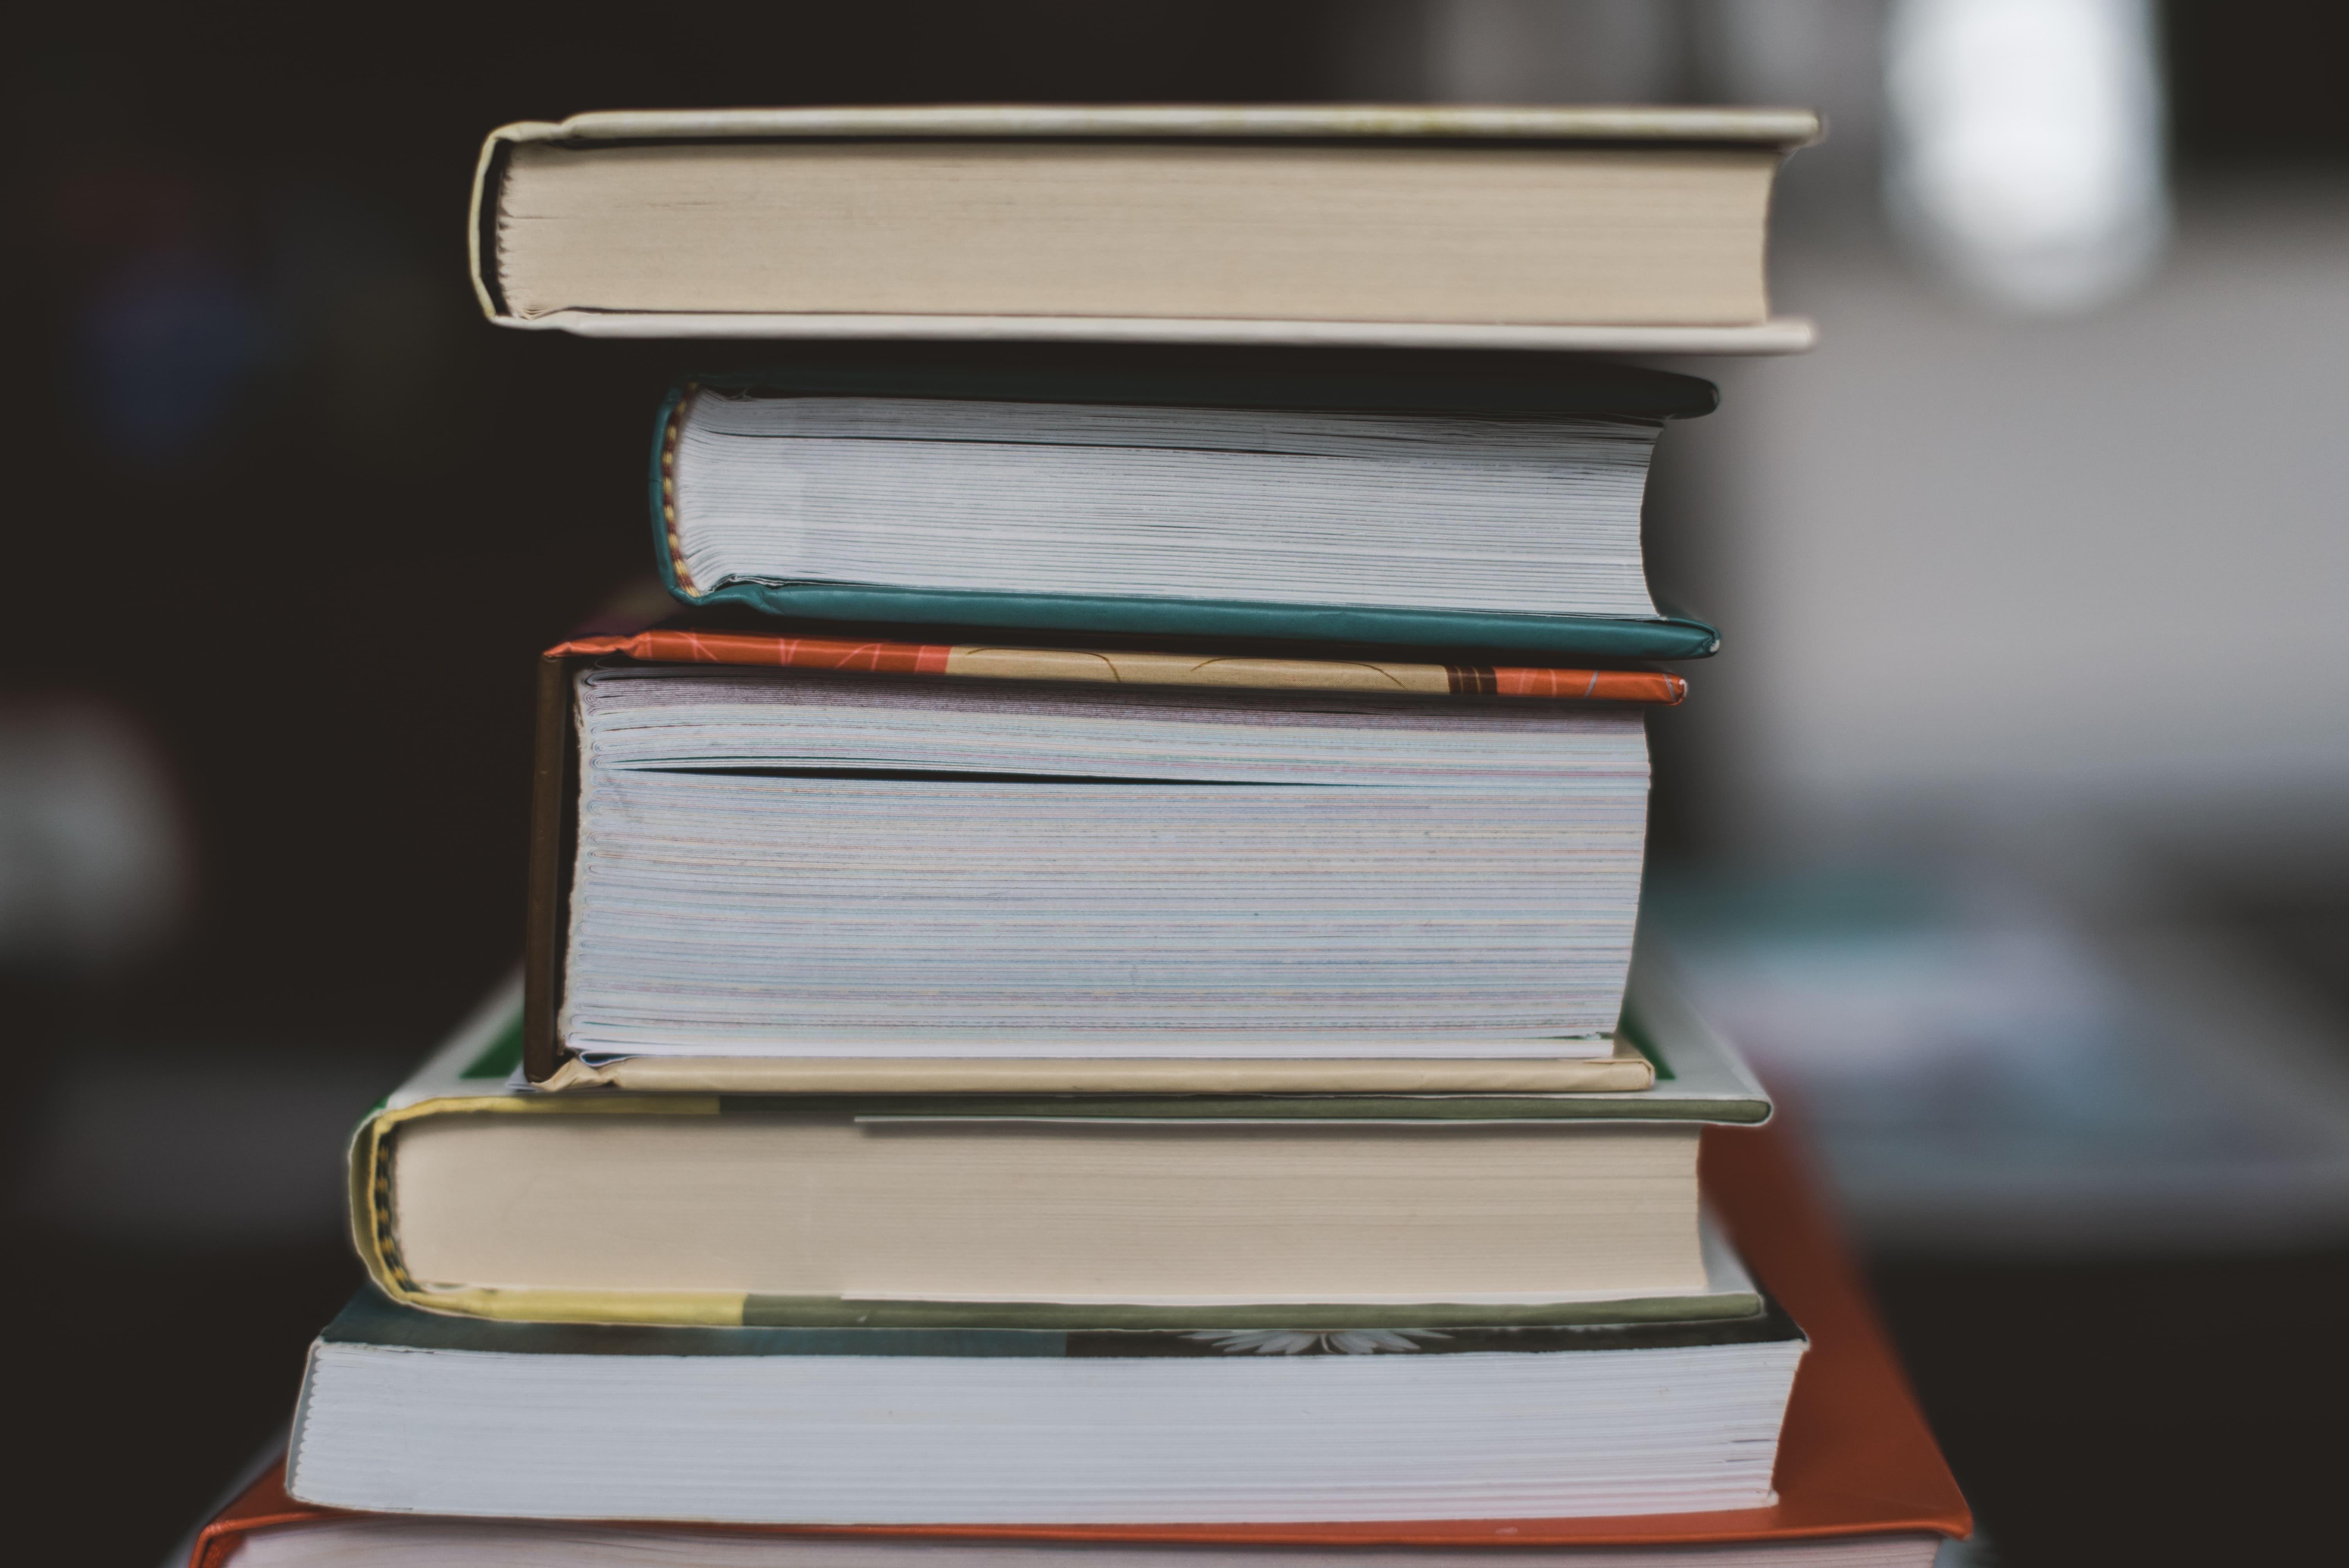 The Best Books of 2021 So Far